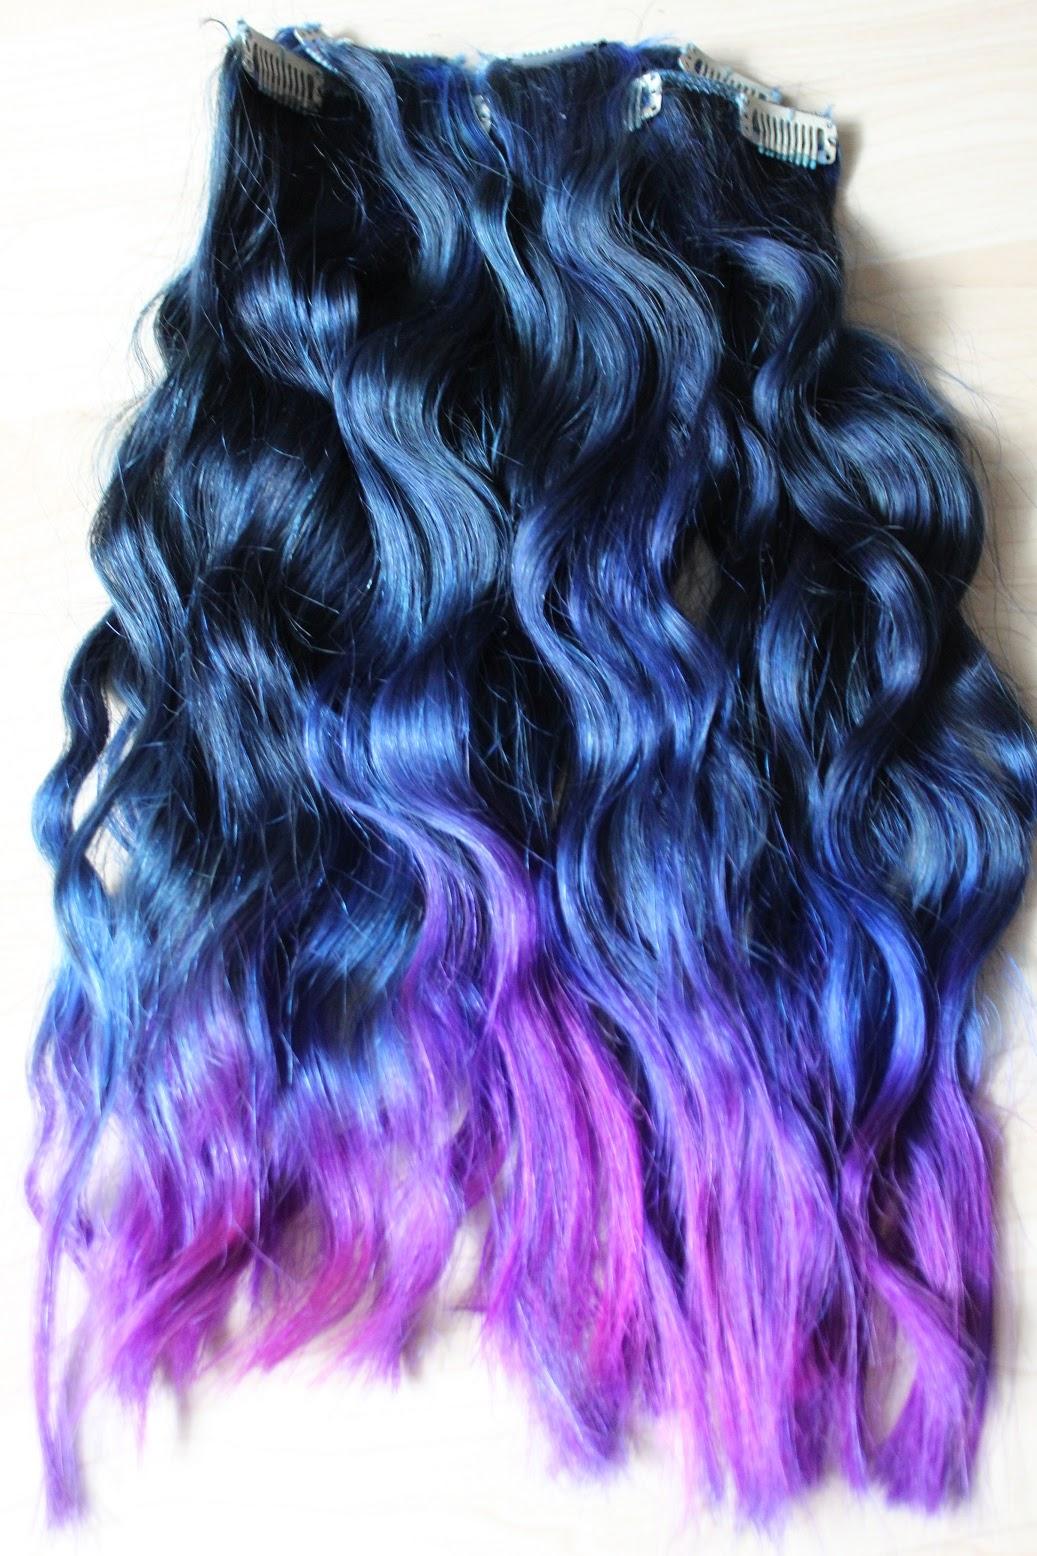 Ira Vampira S Blog Directions Auf Braunem Haar Blau Lila Dip Dye